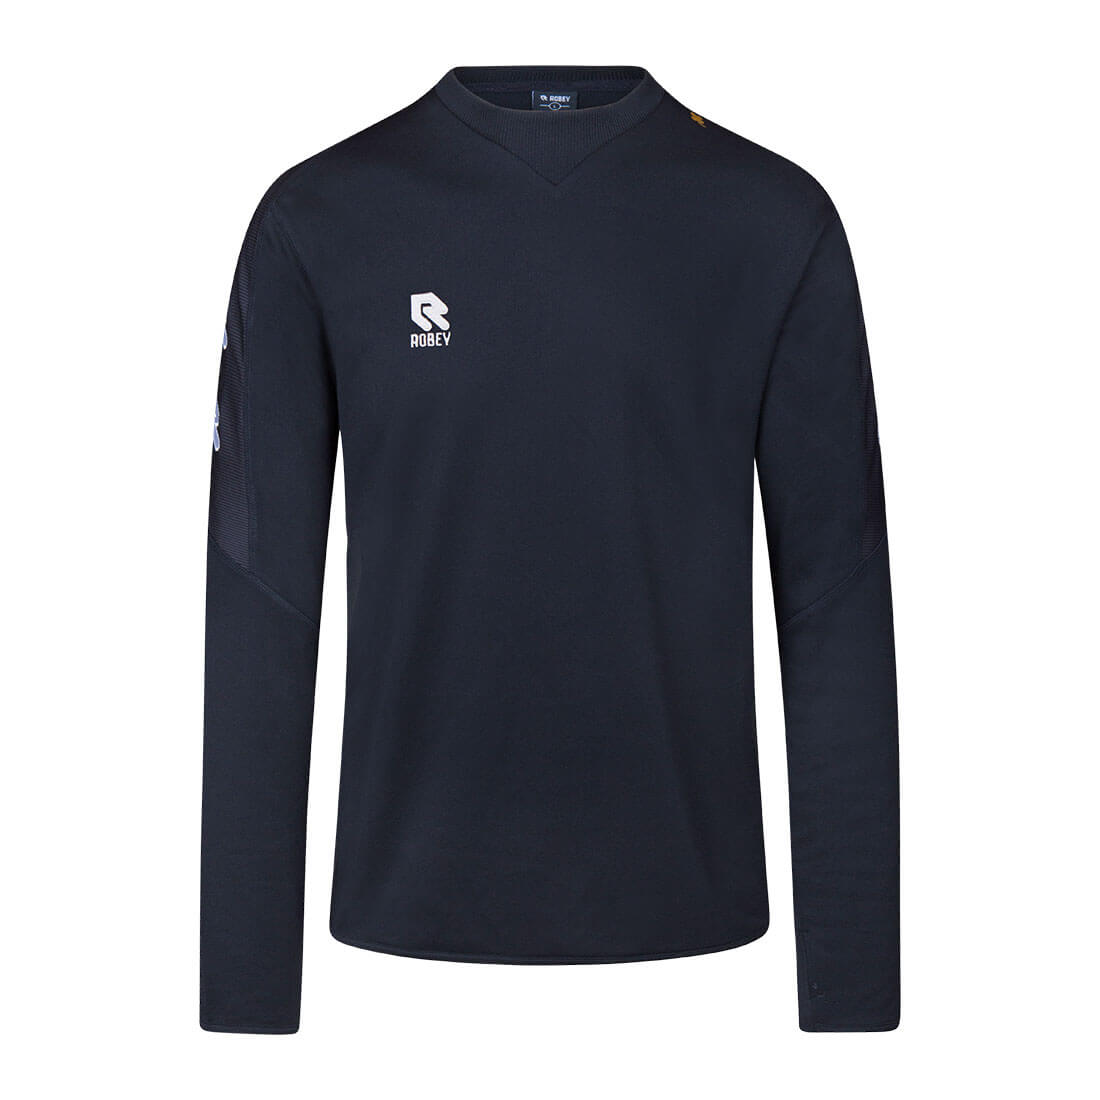 Robey Performance Sweater - Black